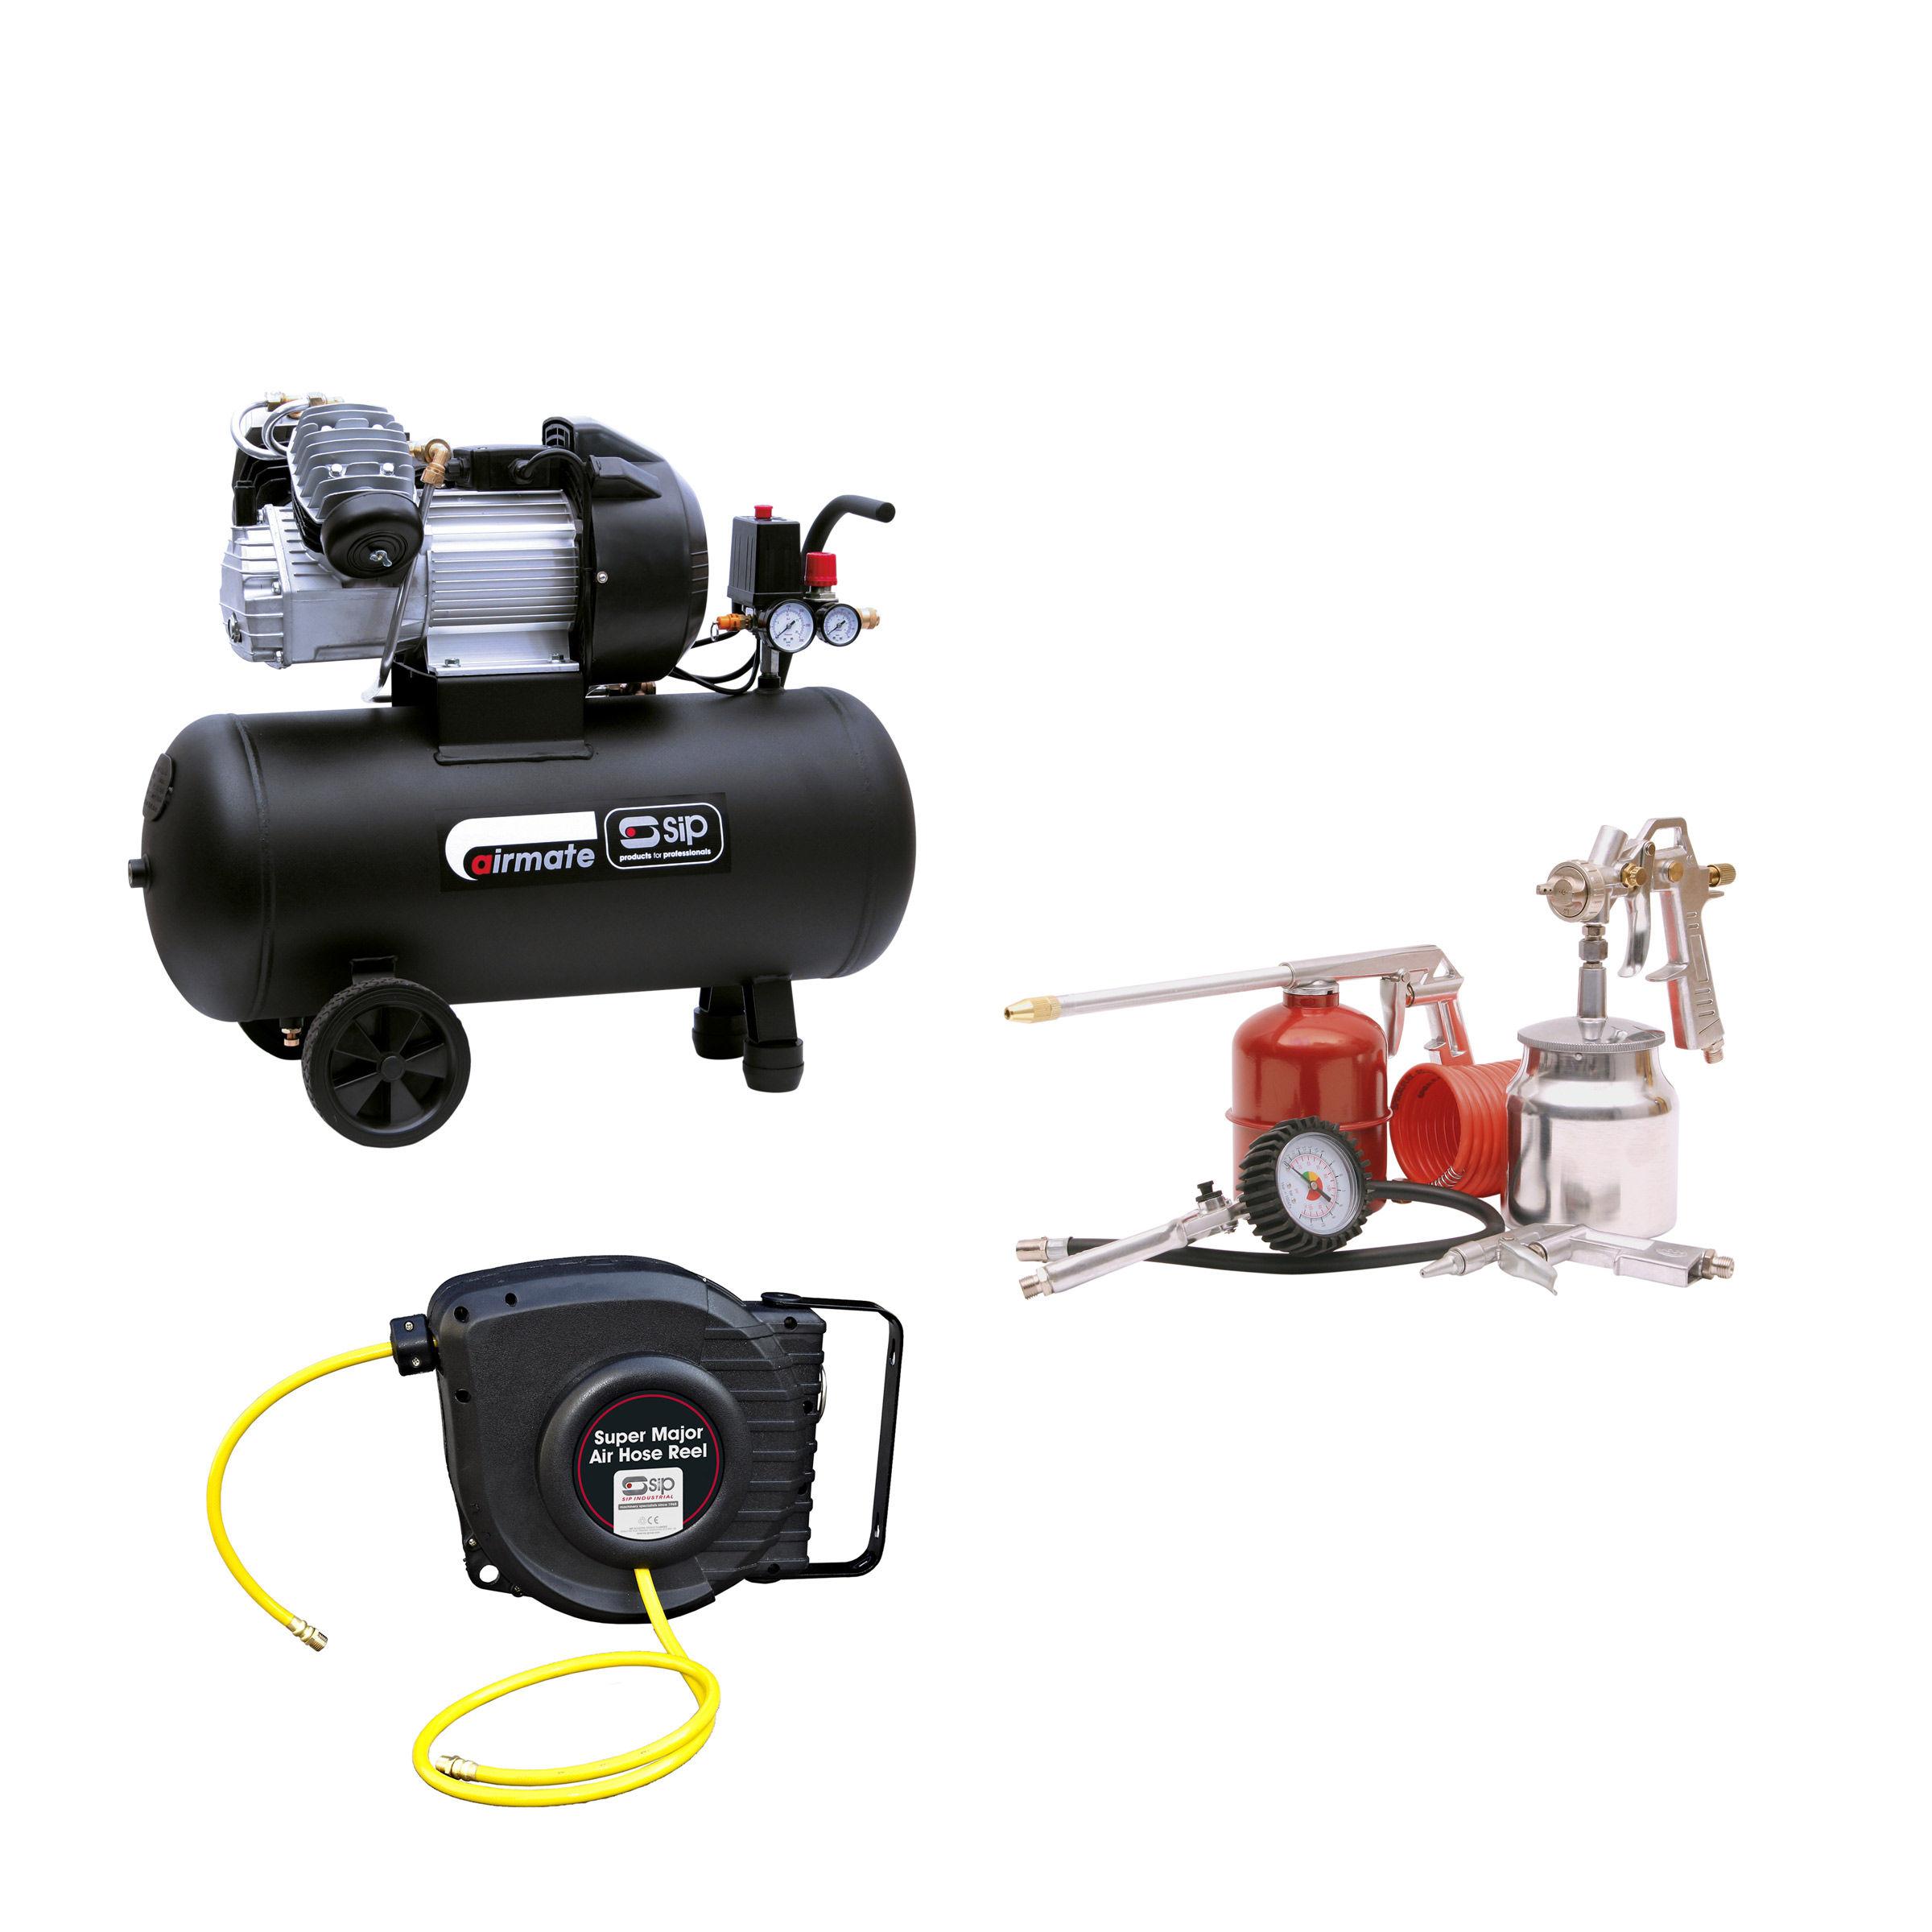 6e45bab7a62 Toolstop SIP 06242TS Airmate TN3.0 50-D Compressor With 04947 5 ...